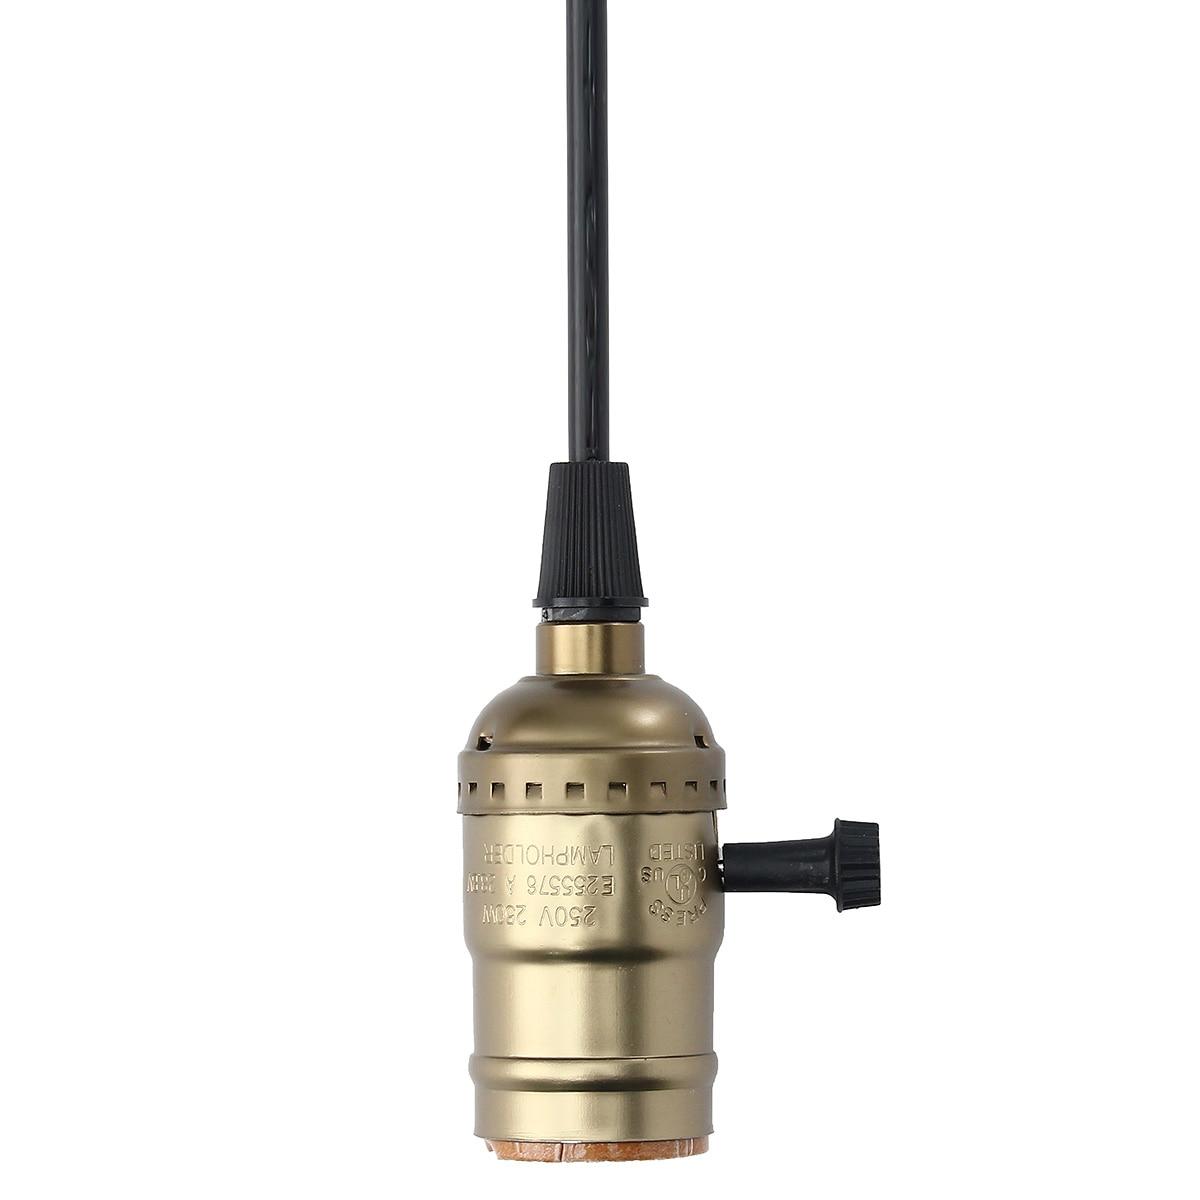 Smuxi Lamp Vintage Base E27/E26 With Swicth 2M Cord 250V 230W Vintage Edison Loft Pendant Light Bulb Socket Holder Lamp Base